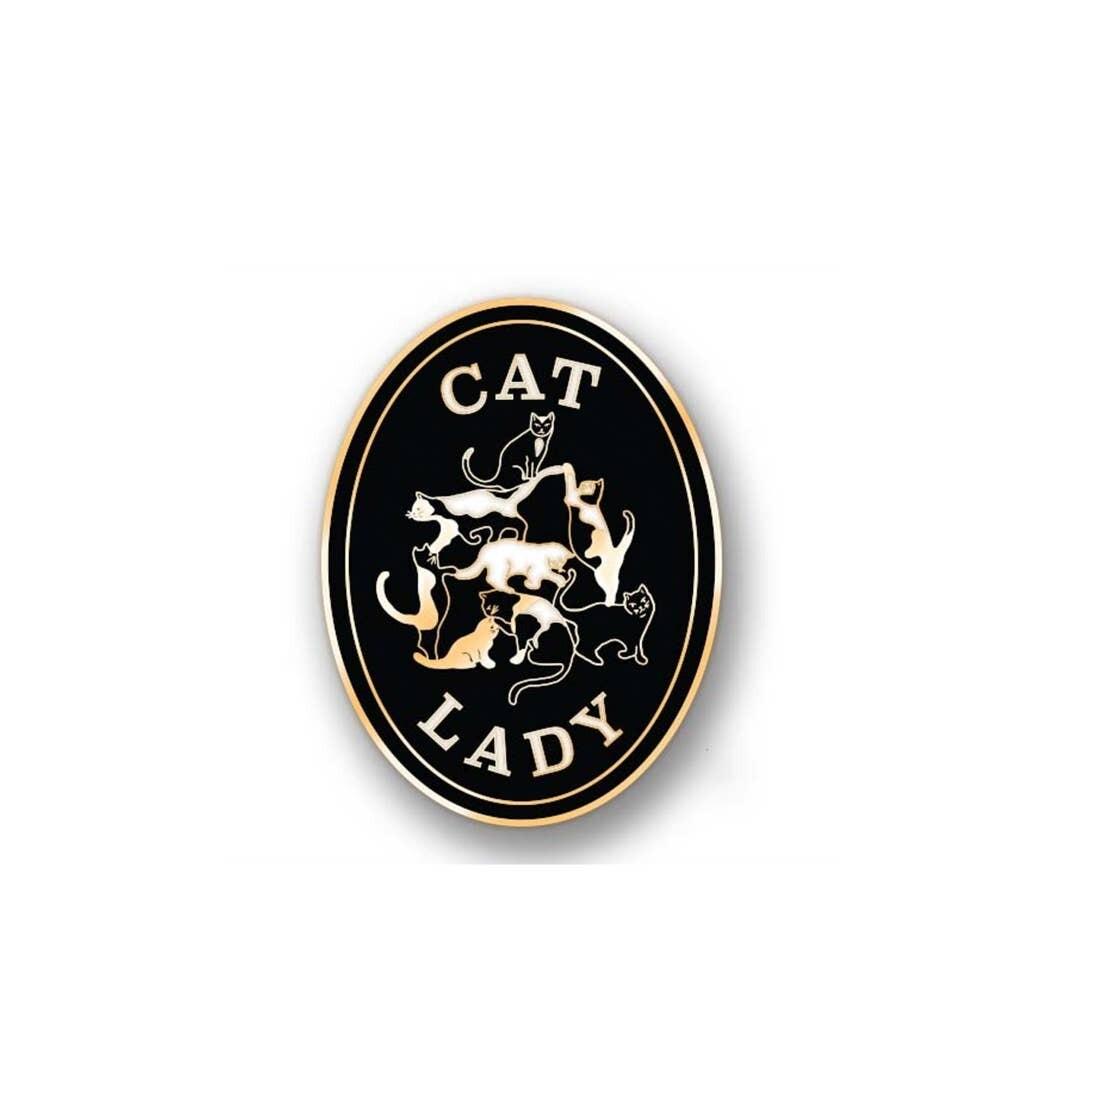 Cat Lady Enamel Pin - AQP5